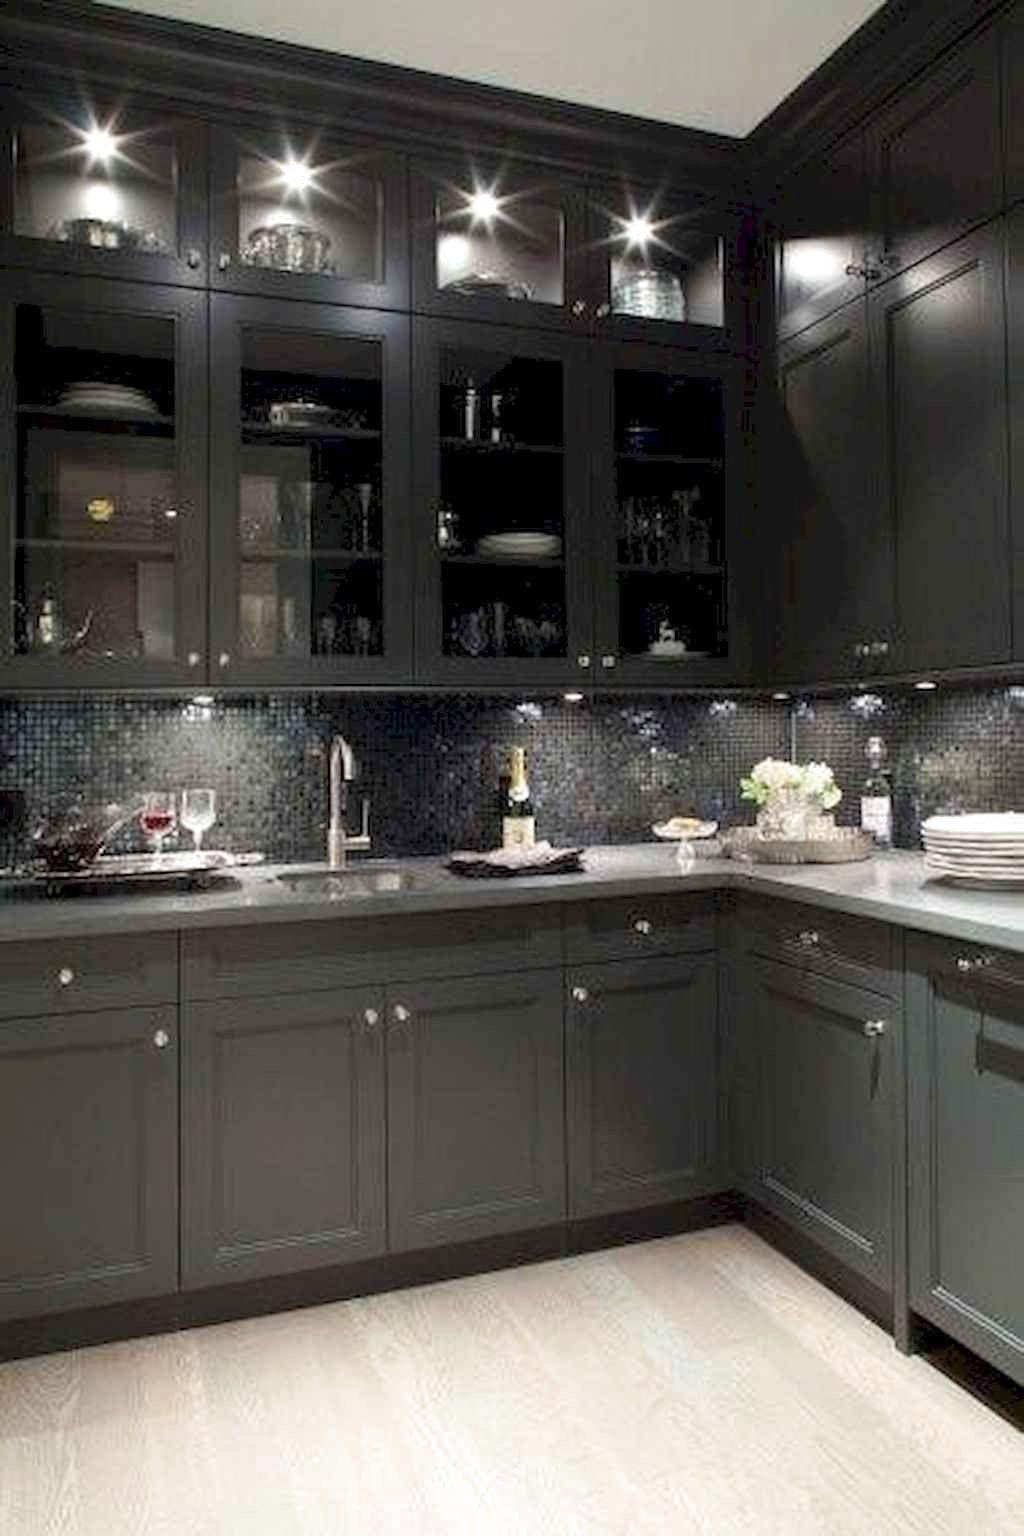 Best Black Kitchen Cabinets Design Ideas Frugal Living Shaker Style Kitchen Cabinets Modern Kitchen Design Kitchen Cabinet Styles